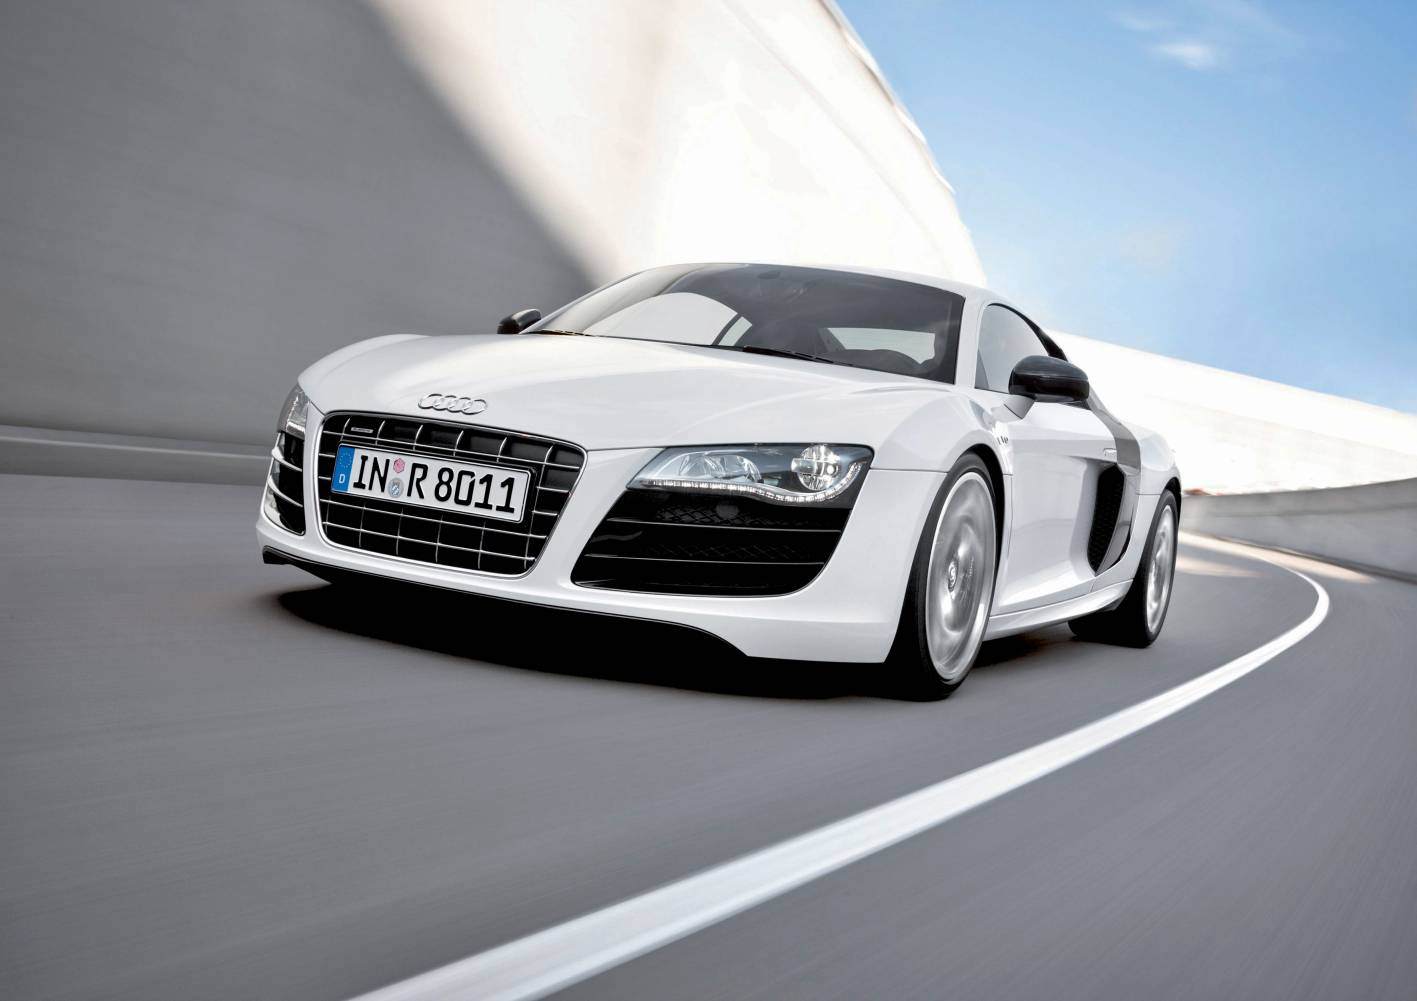 http://4.bp.blogspot.com/_ddEtvpt28yA/TUD1GZ7swXI/AAAAAAAABnc/FnzSyJoLqHg/s1600/Audi+R8+V10+11.jpg